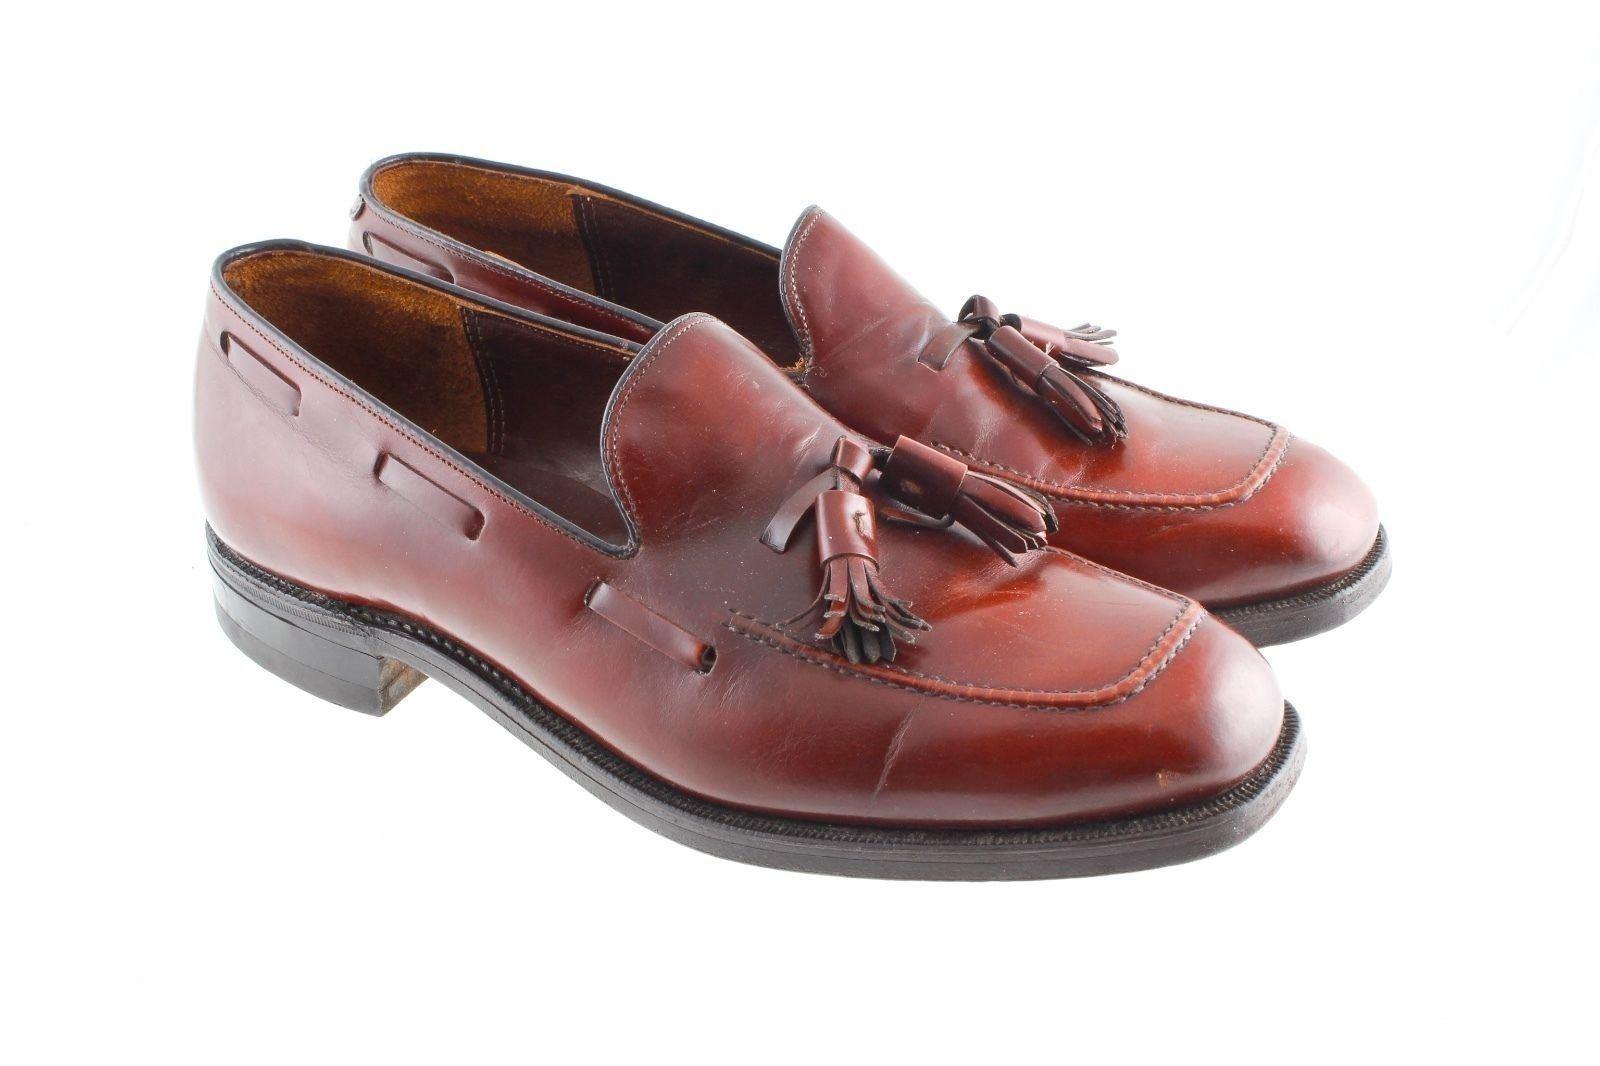 Johnston & & & Murphy braun Leather Tassel Loafers Größe 8 D Vintage 043704